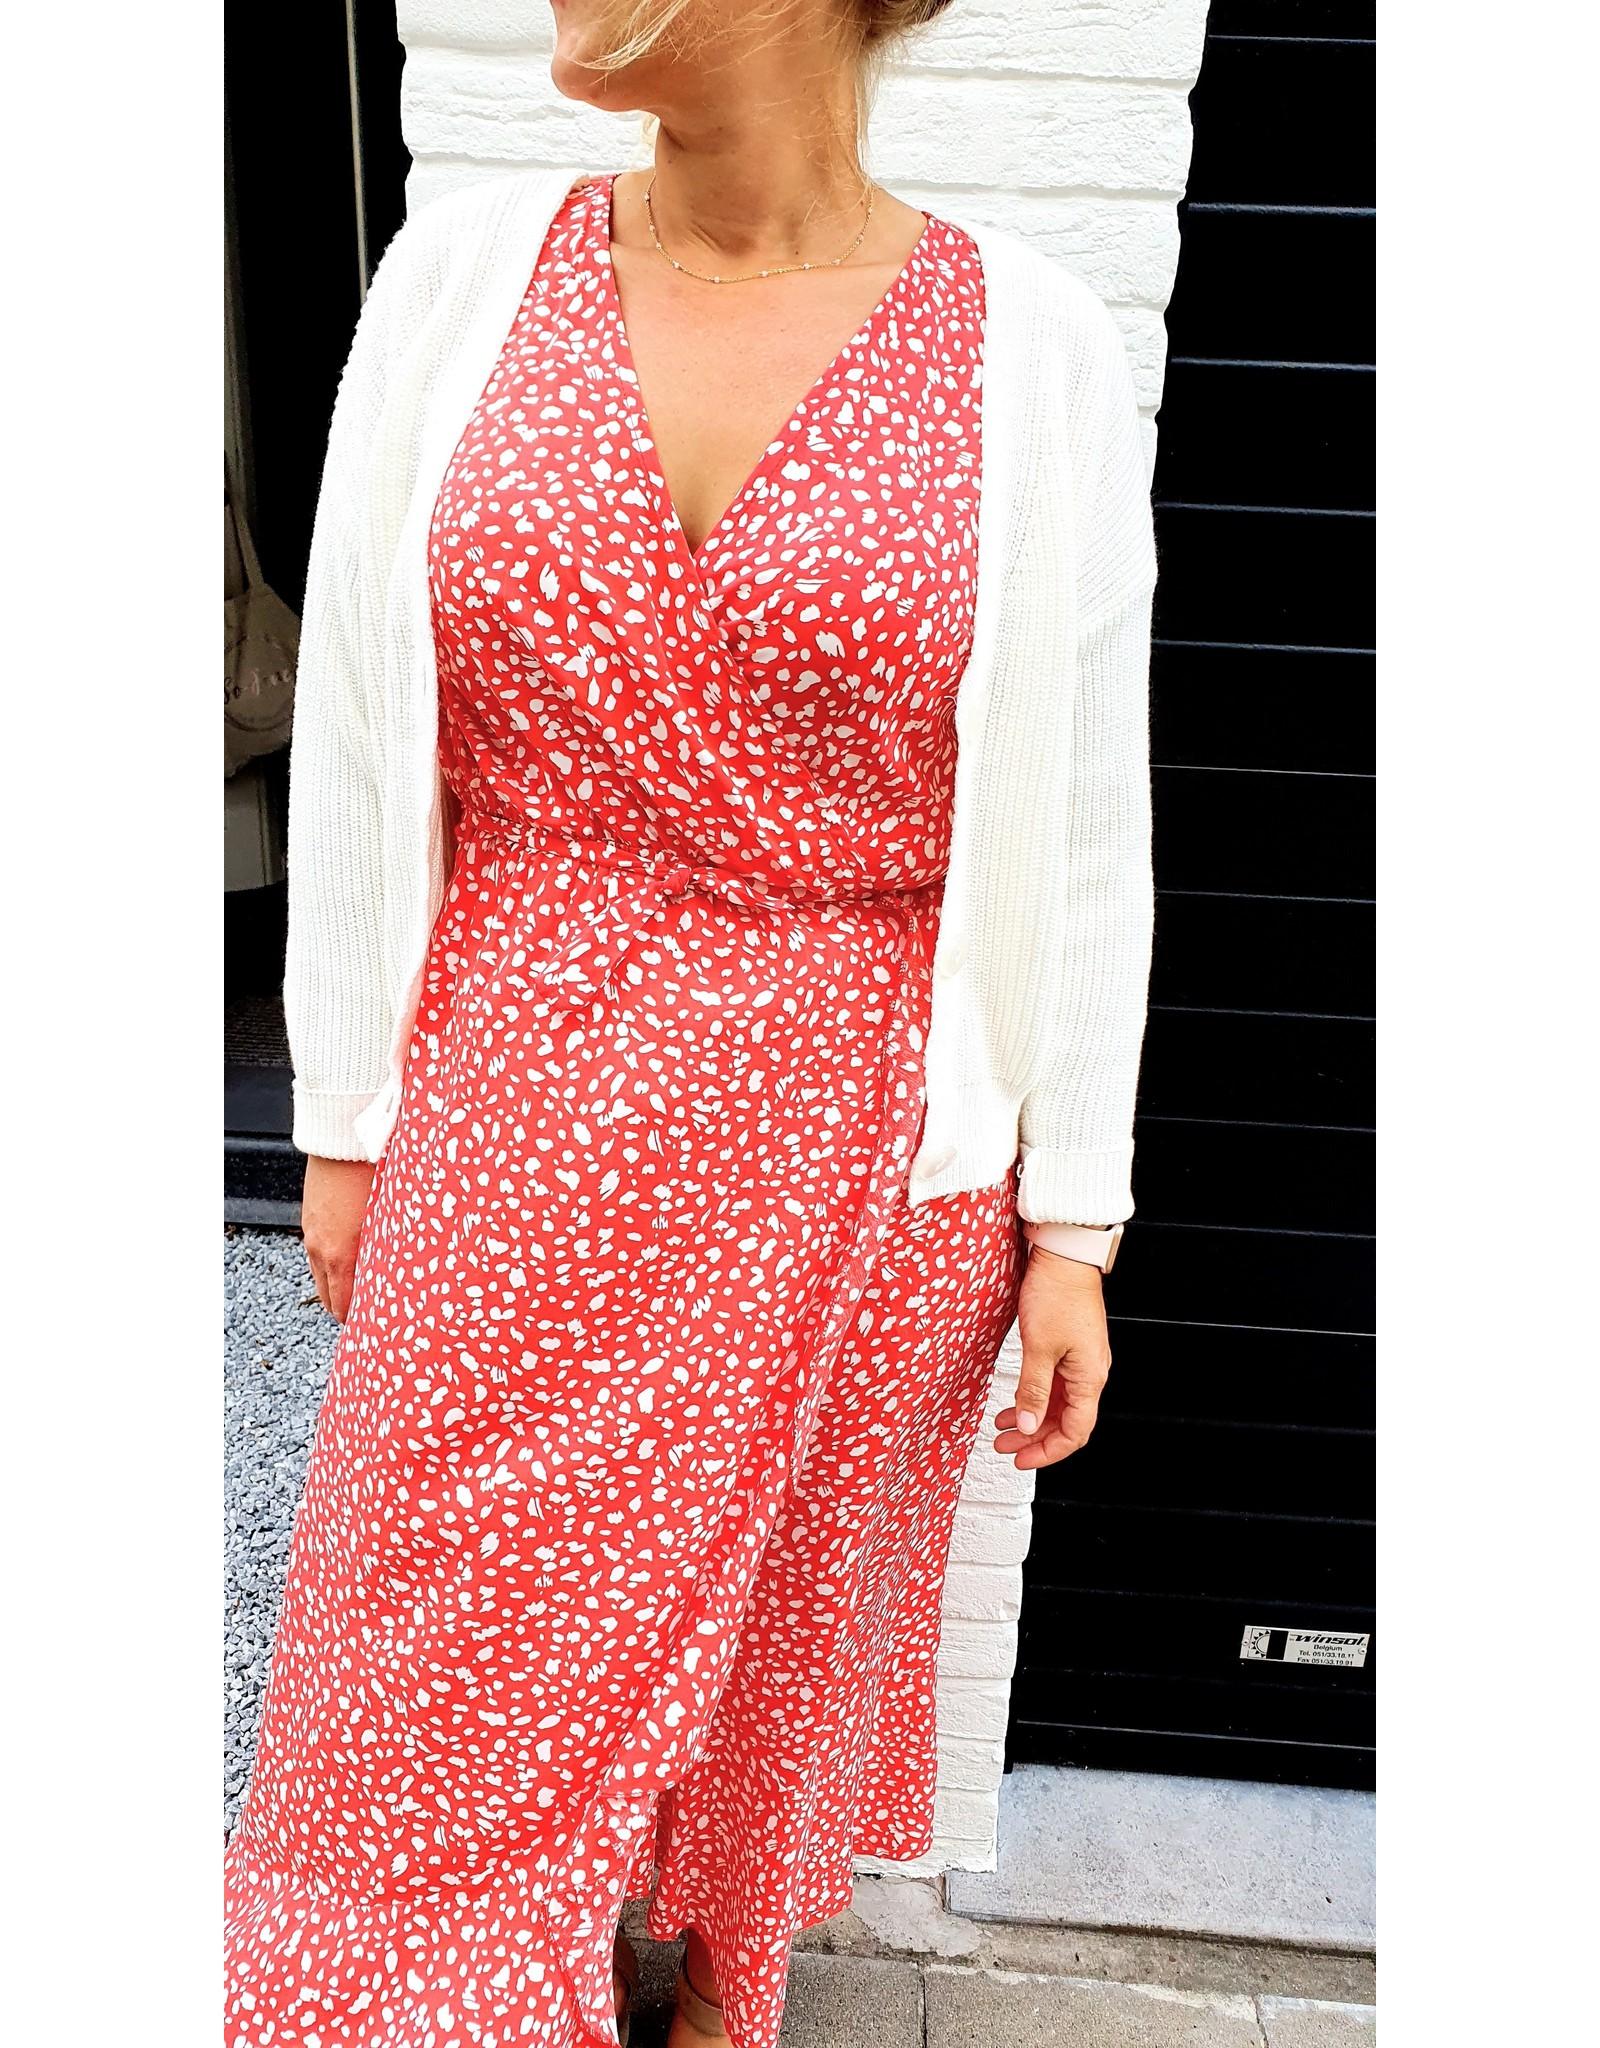 Thé red leopard dress